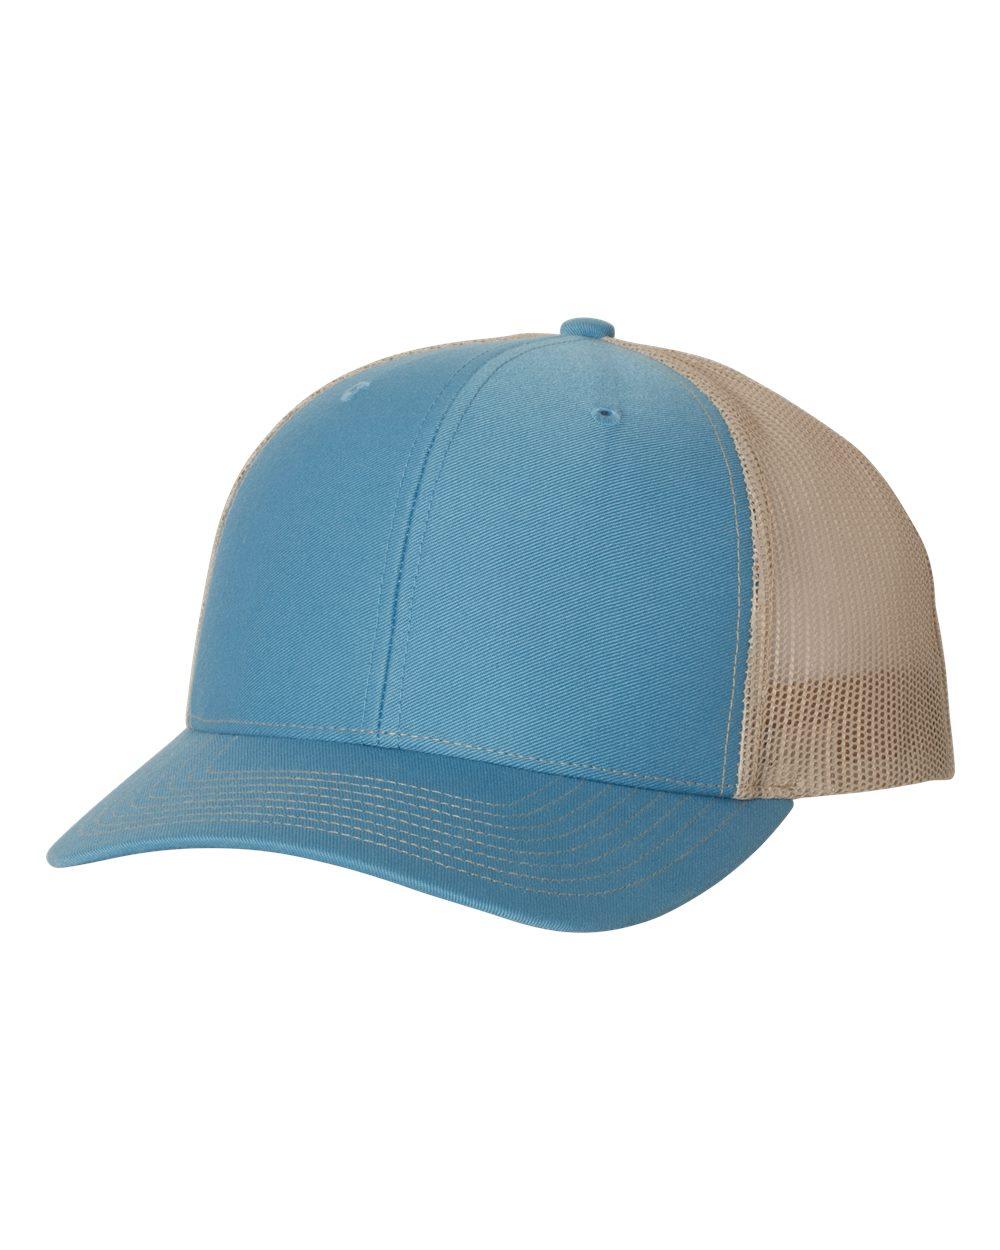 Columbia Blue / Khaki